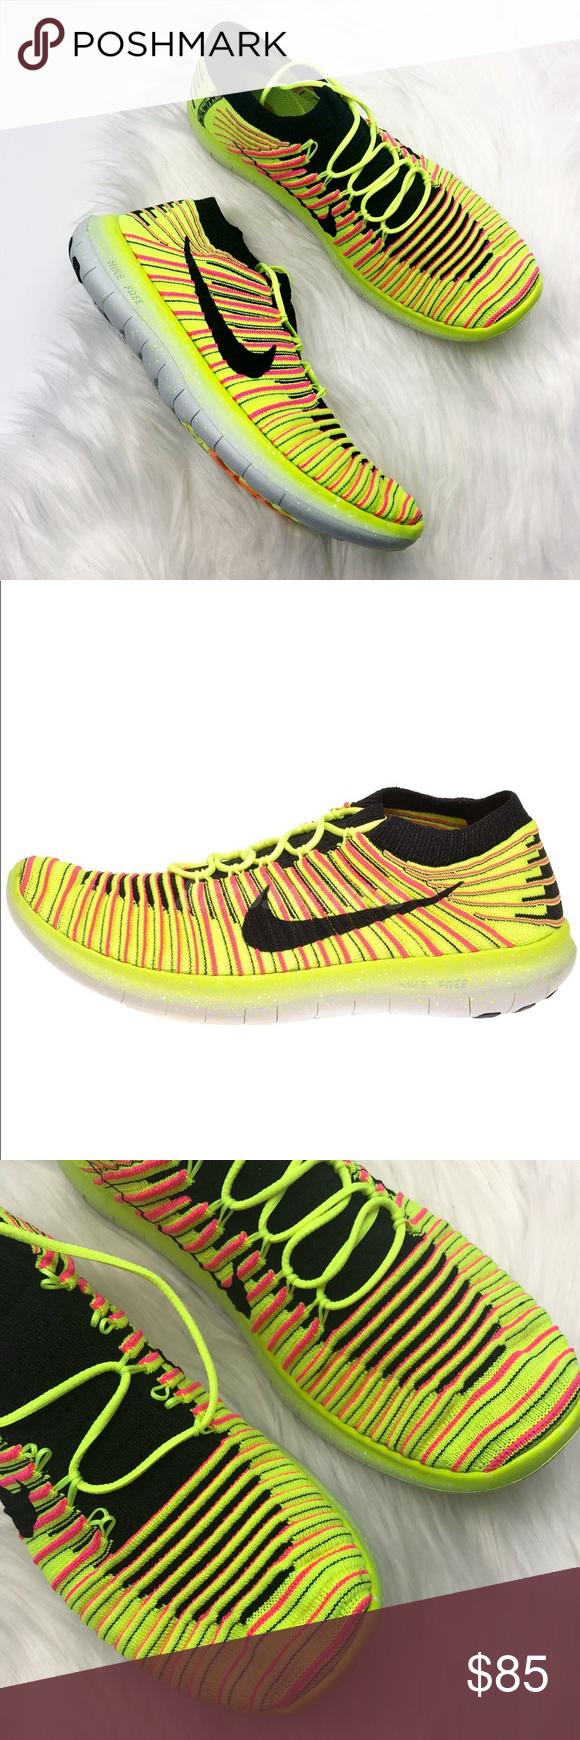 New Nike Free Zapatillas Run Natural Neon Zapatillas Free Nwt Pinterest 080c4c